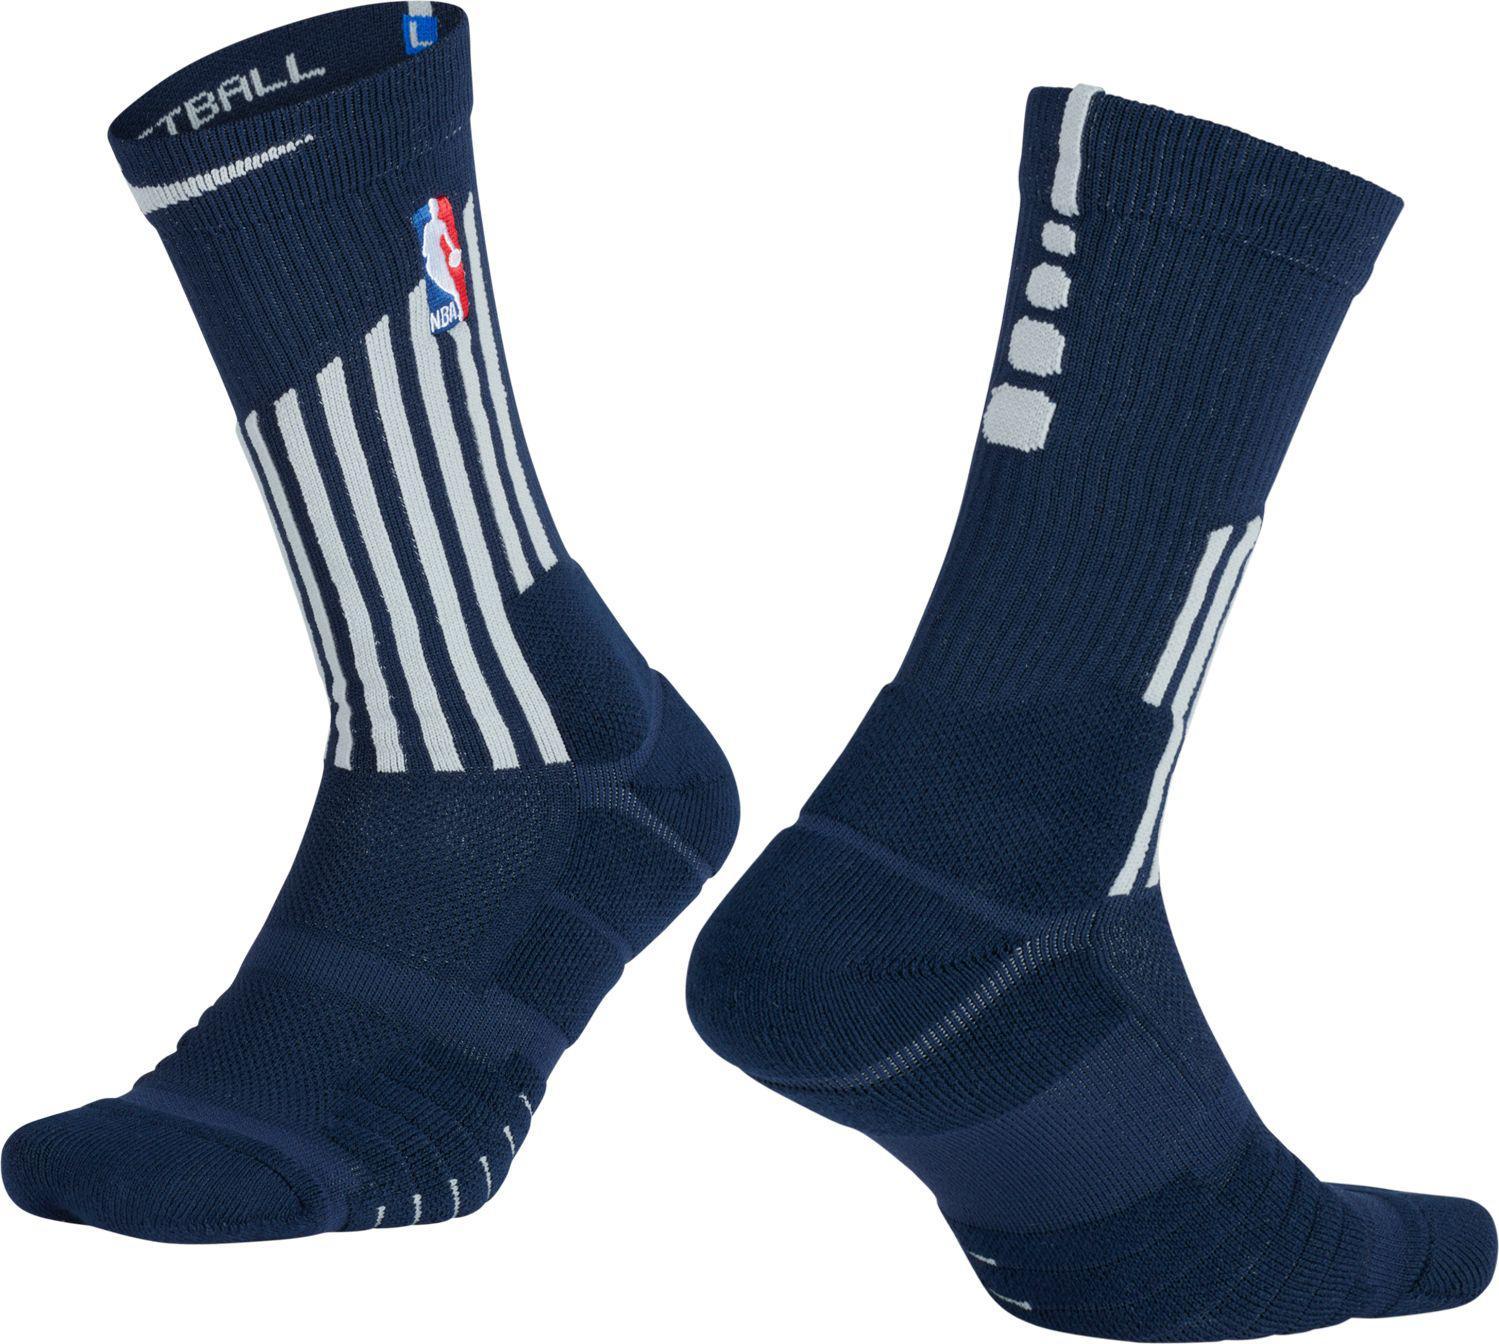 99b105b37 Nike Detroit Pistons City Edition Elite Quick Nba Crew Socks in Blue ...